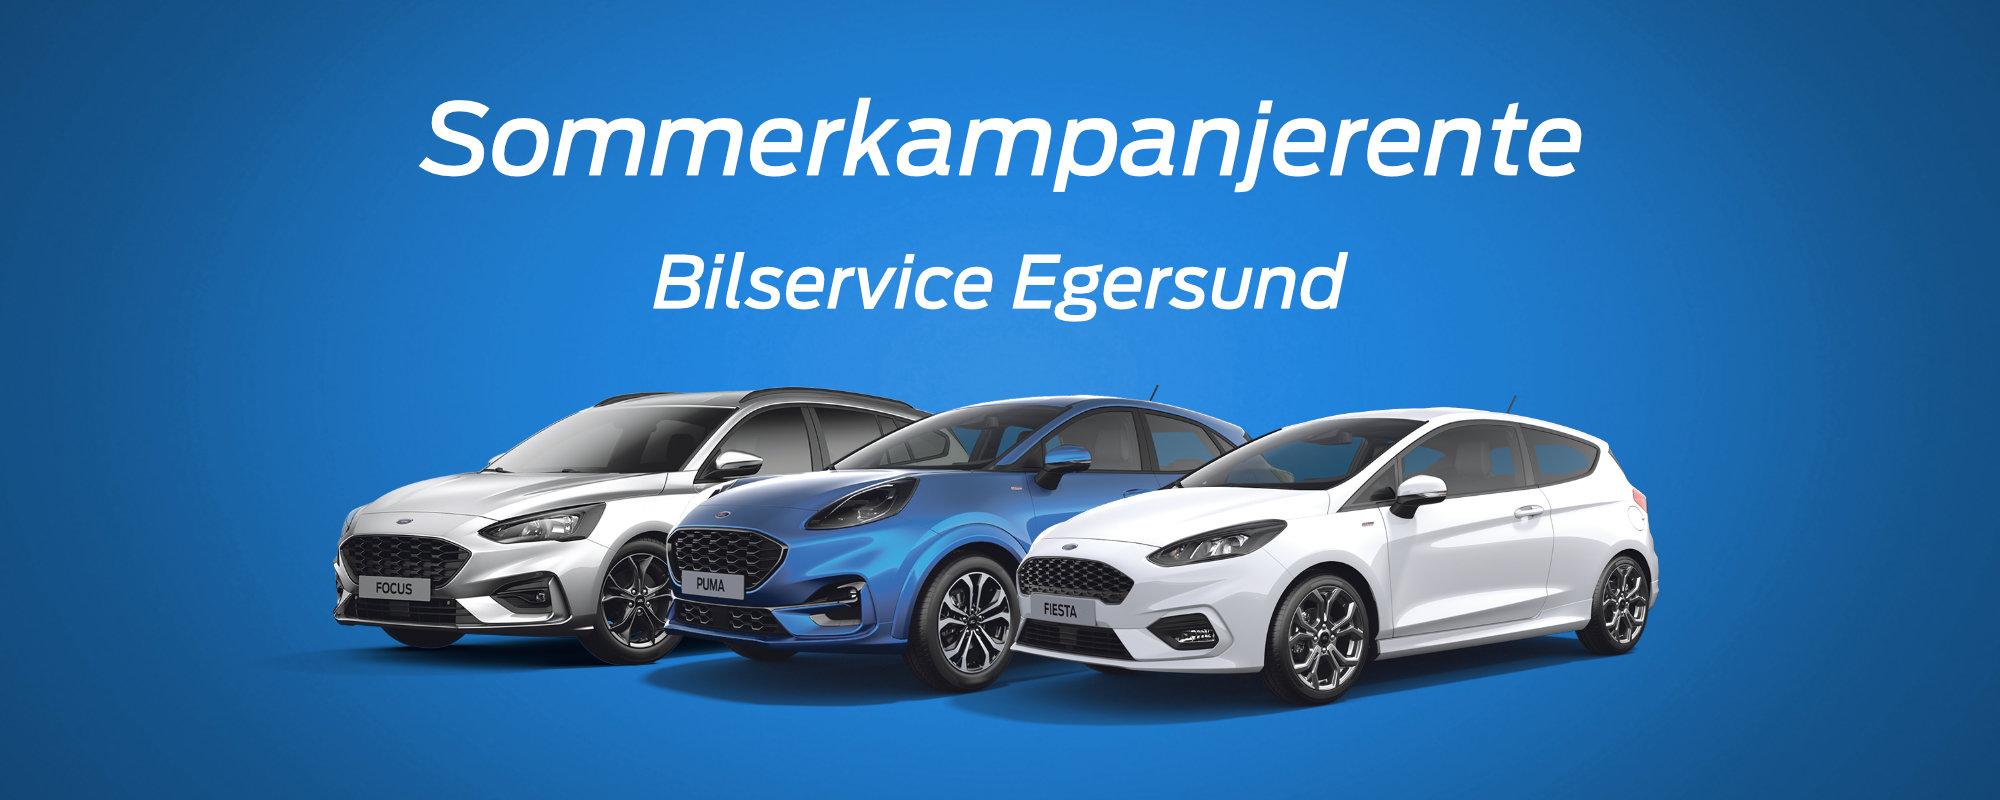 Bilservice Egersund - Sommerkampanje bruktbil